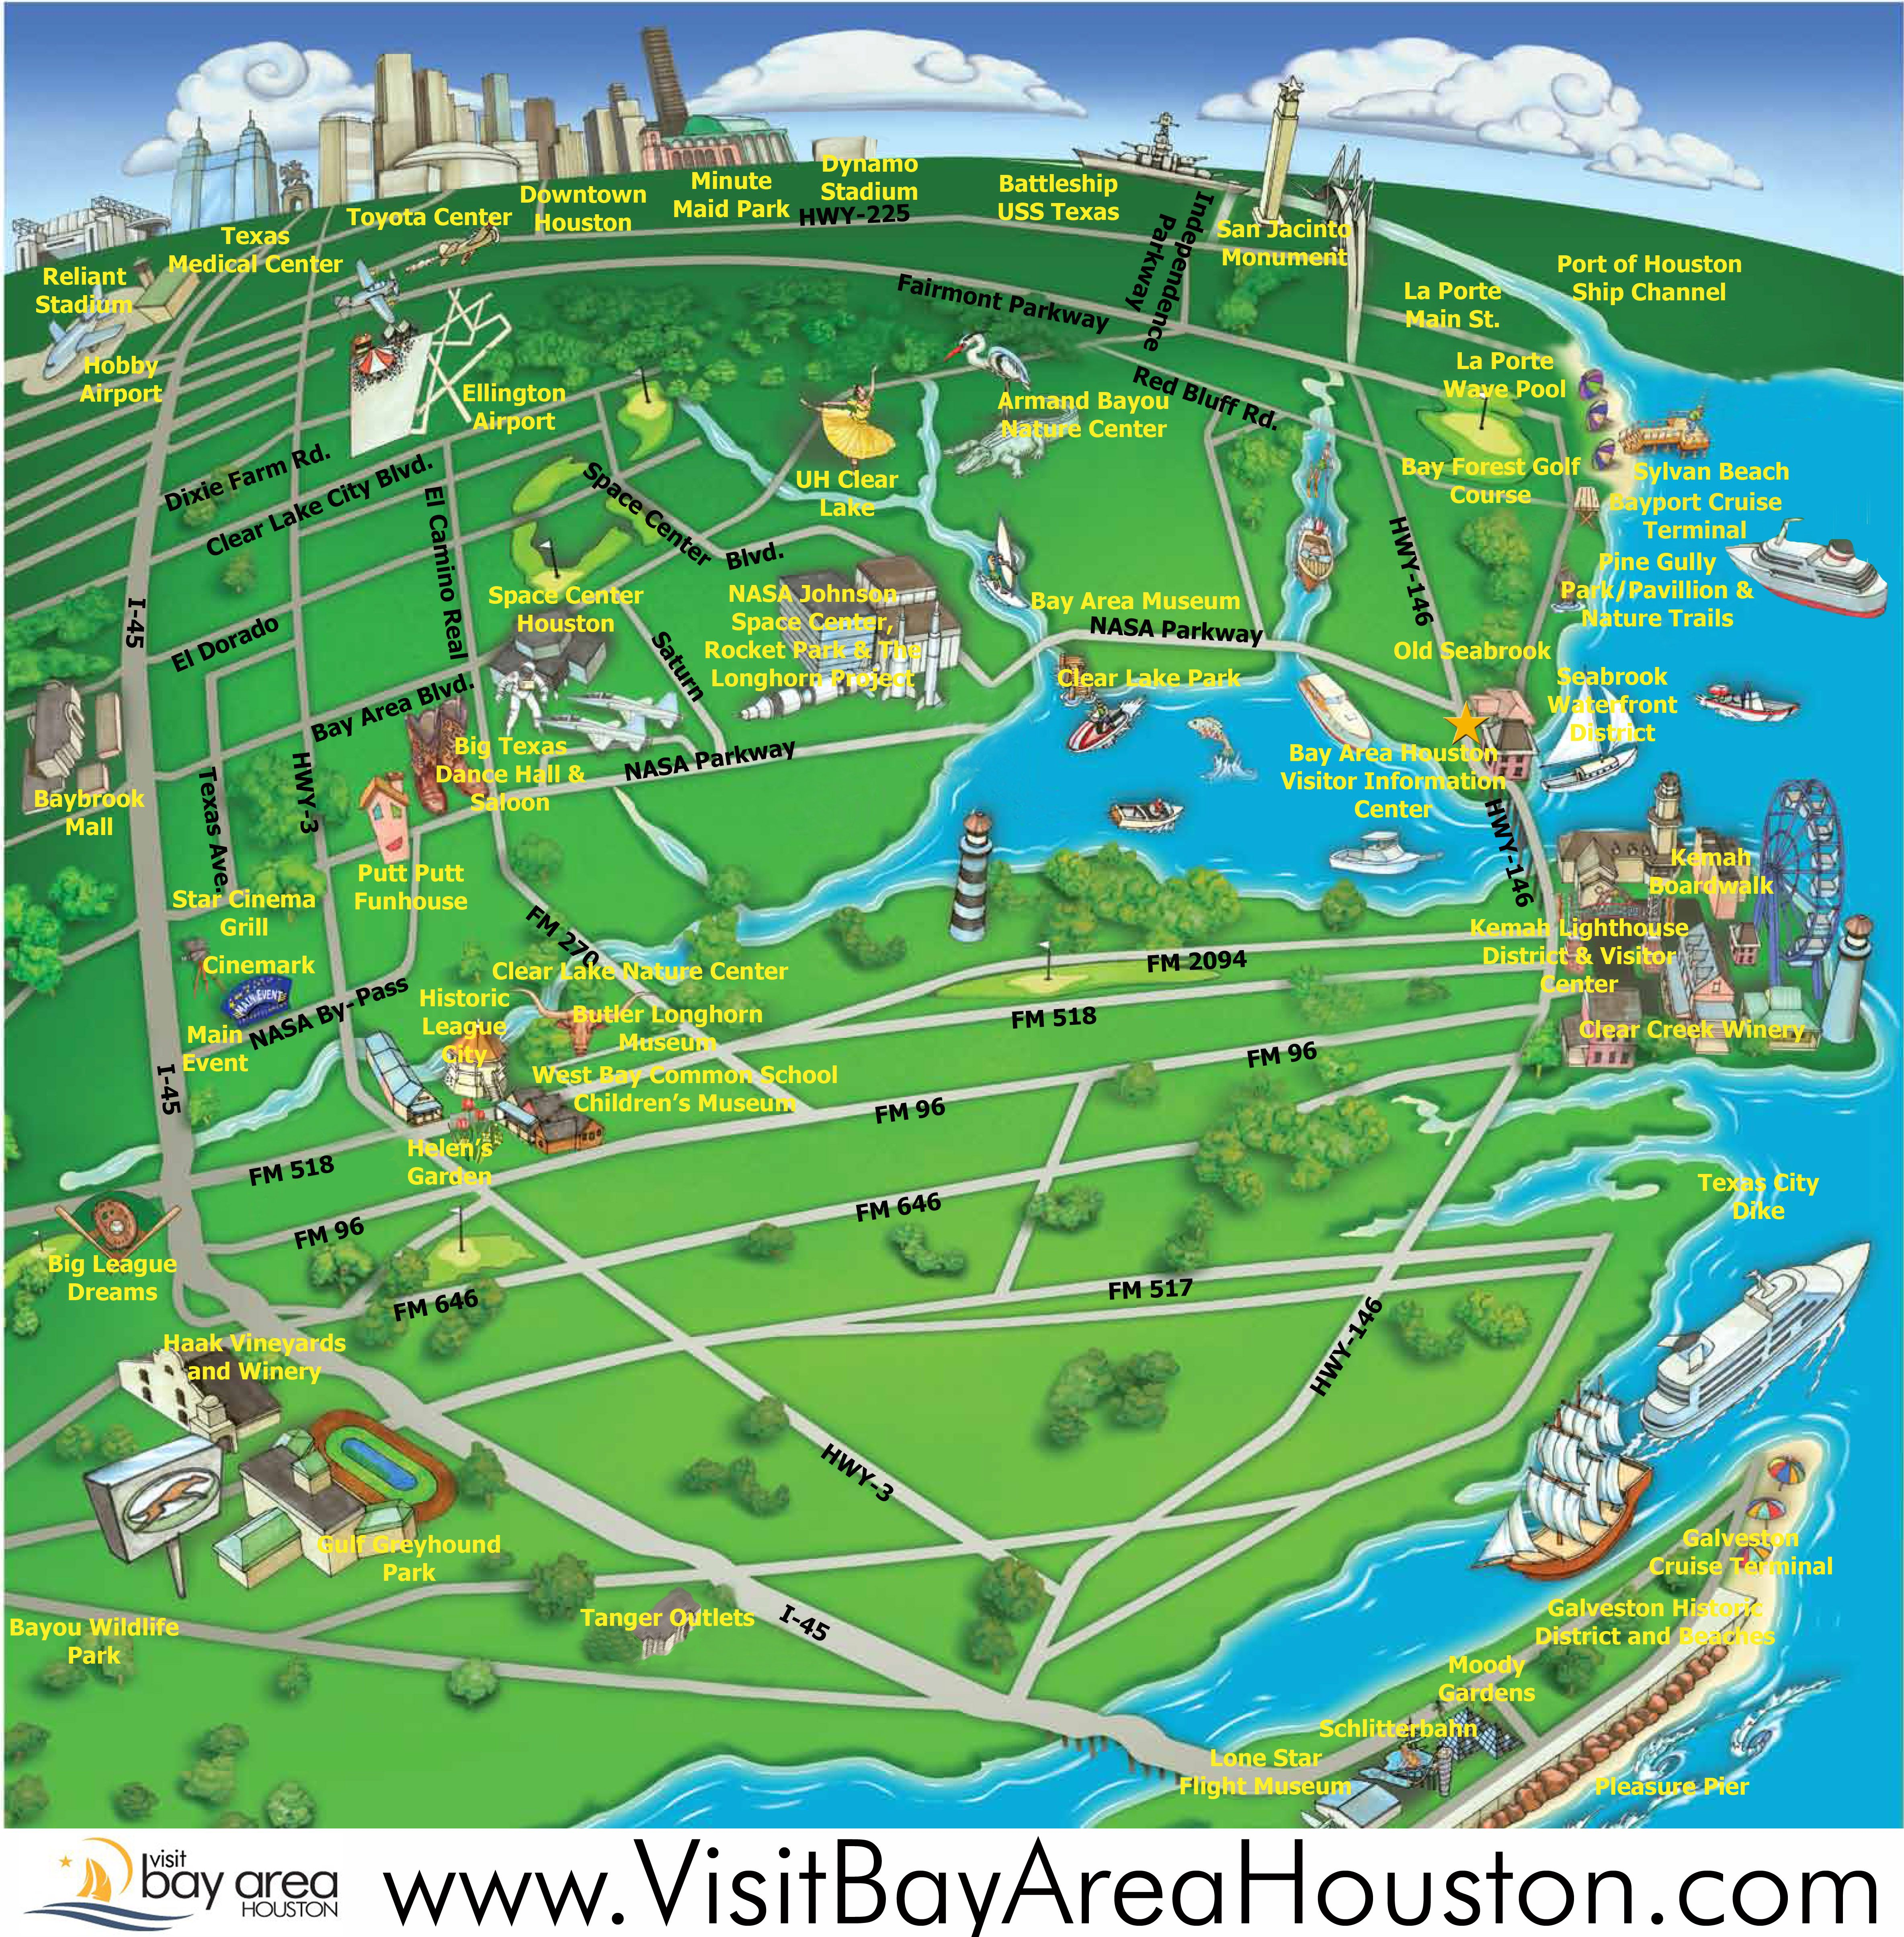 kemah seabrook map | Map | League City / Galveston Bay ... on lufkin tx city map, south houston tx city map, galveston tx city map, kountze tx city map, jefferson tx city map, port aransas tx city map, grapeland tx city map, kaufman tx city map, clear lake tx city map, katy tx city map, lake jackson tx city map, pearland tx city map, lampasas tx city map, la porte tx city map, conroe tx city map, angleton tx city map, brenham tx city map, lewisville tx city map,